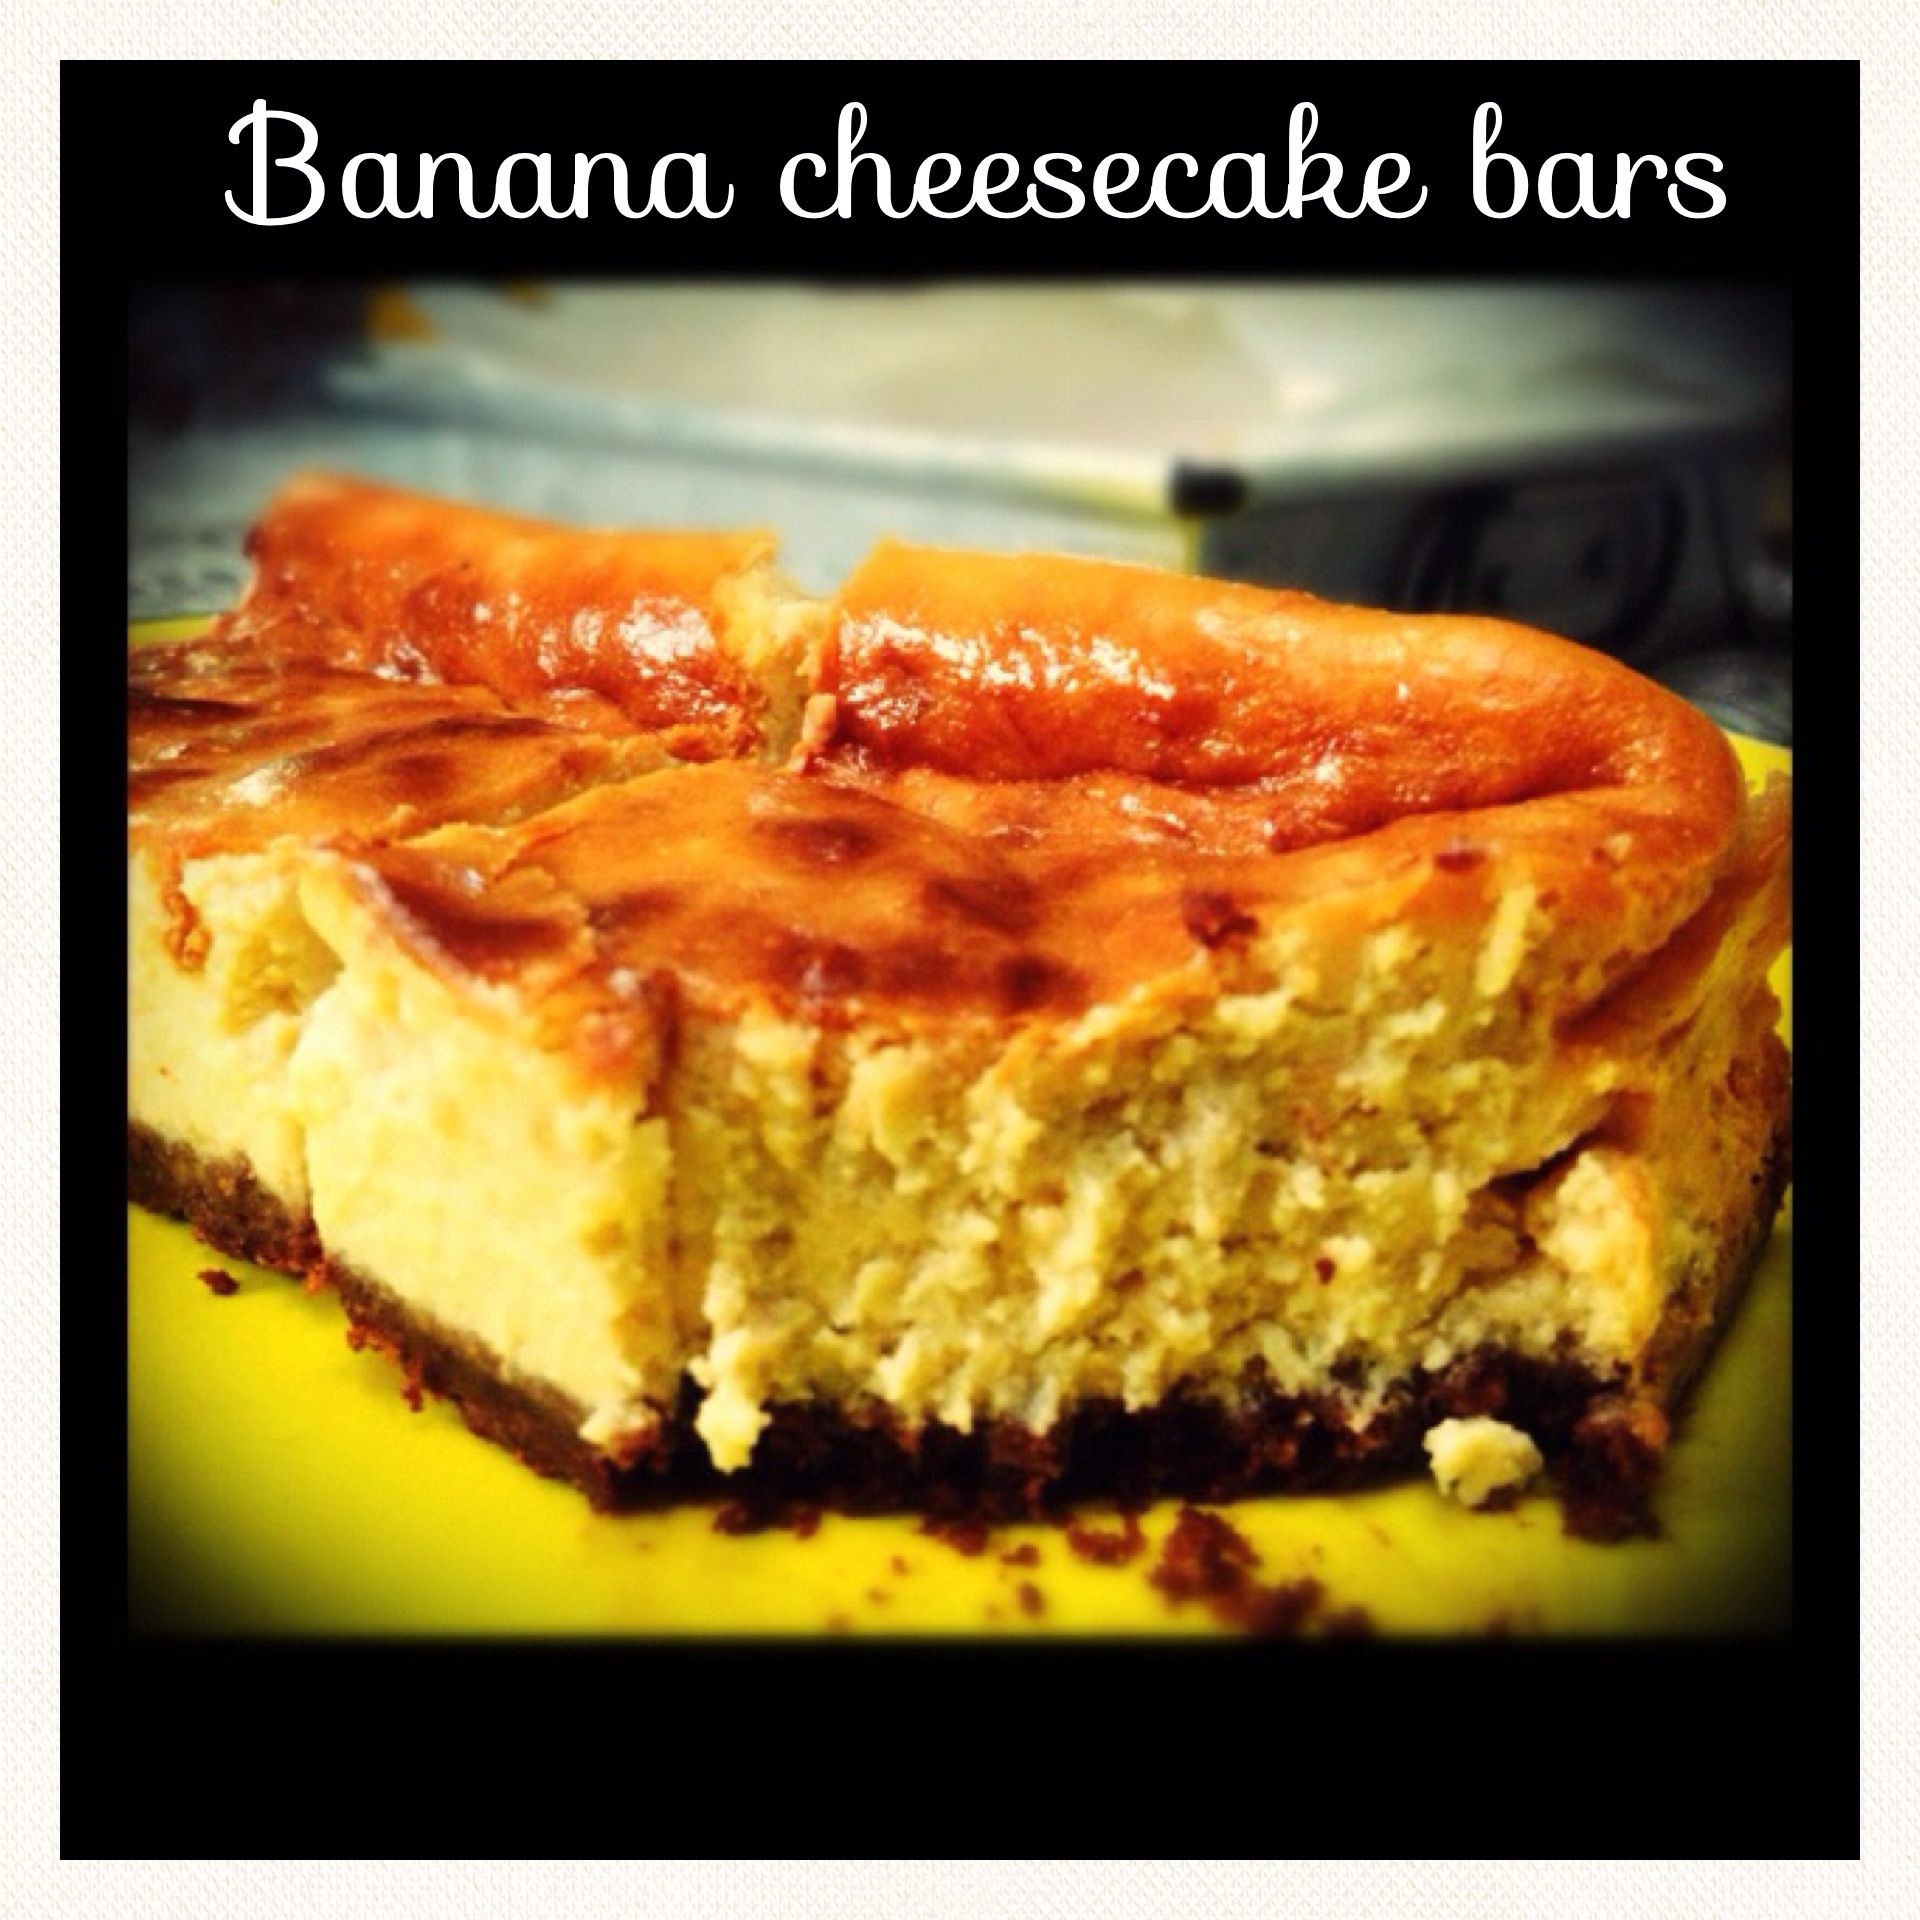 Banana cheesecake bars